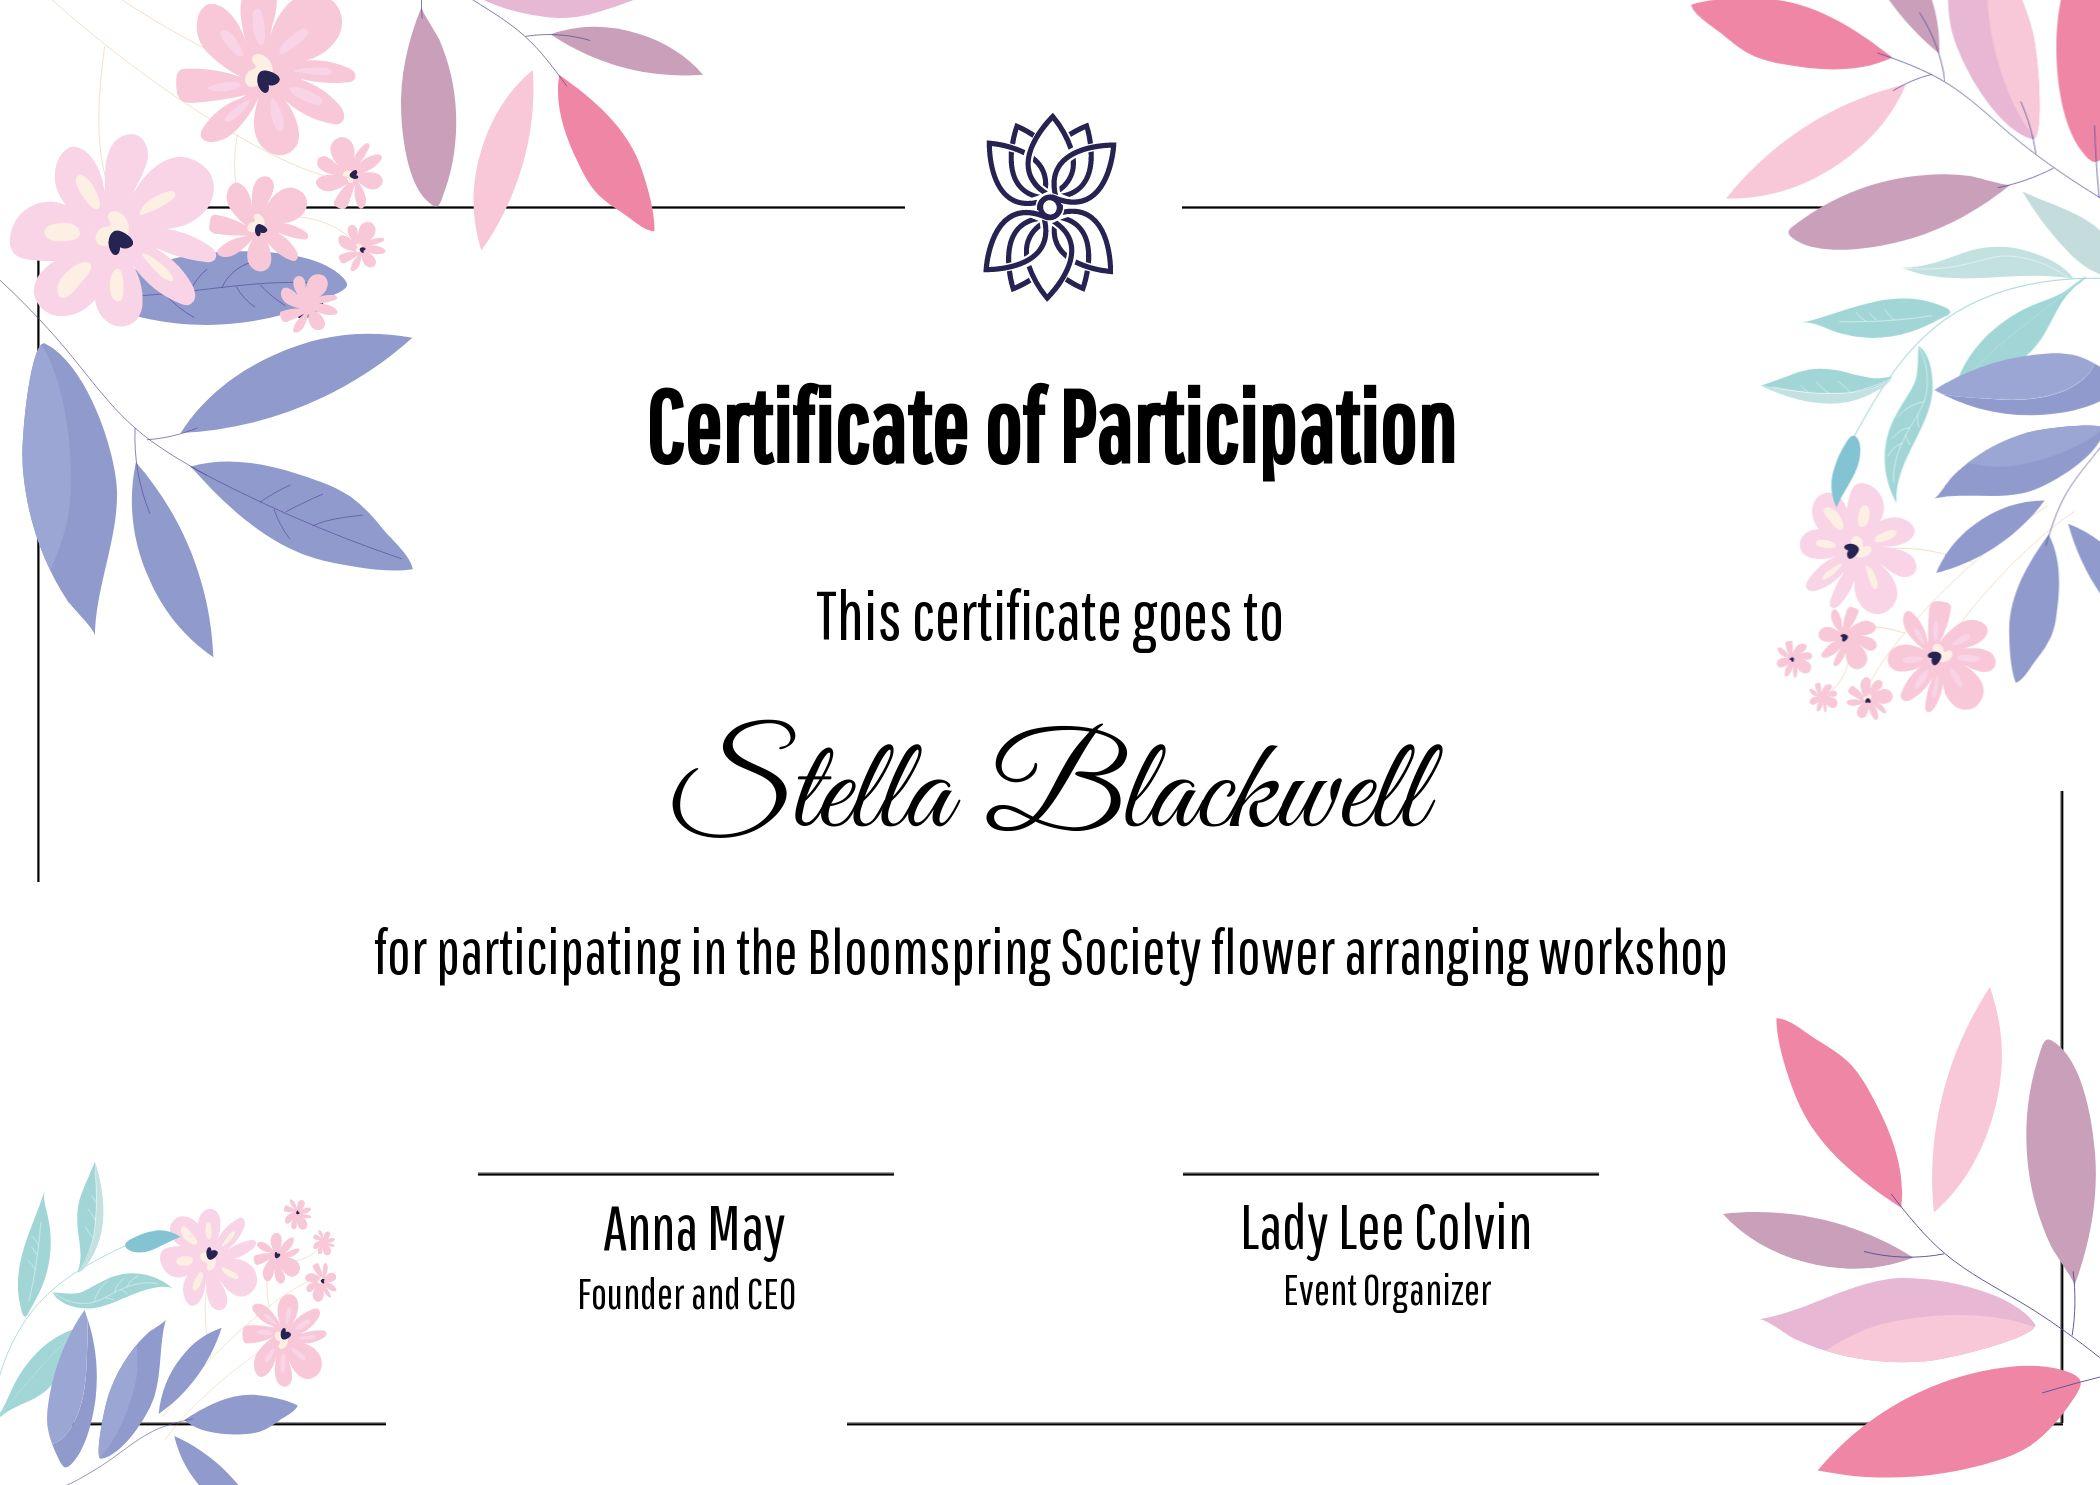 Certificate Of Participation Flower Arranging Workshop